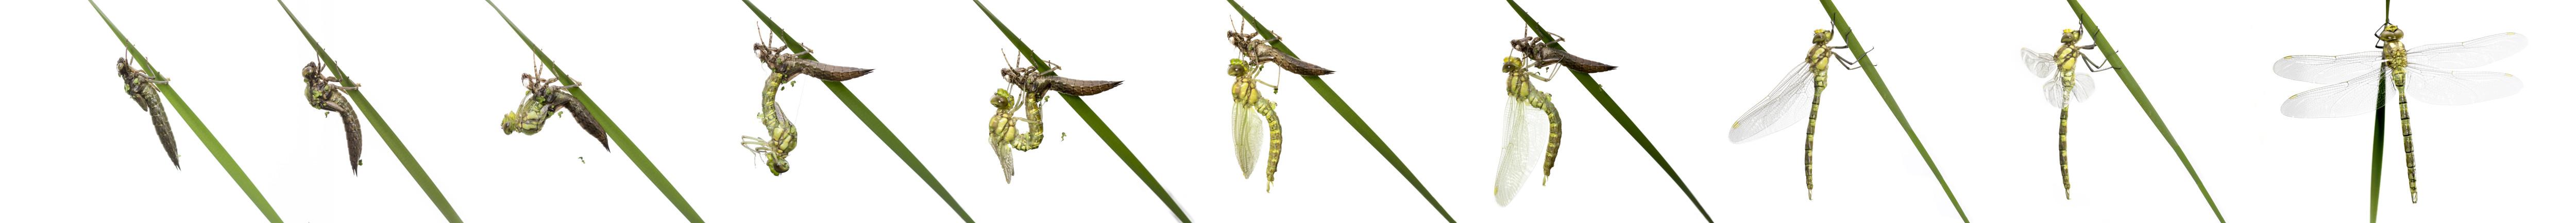 Dragonfly emergence